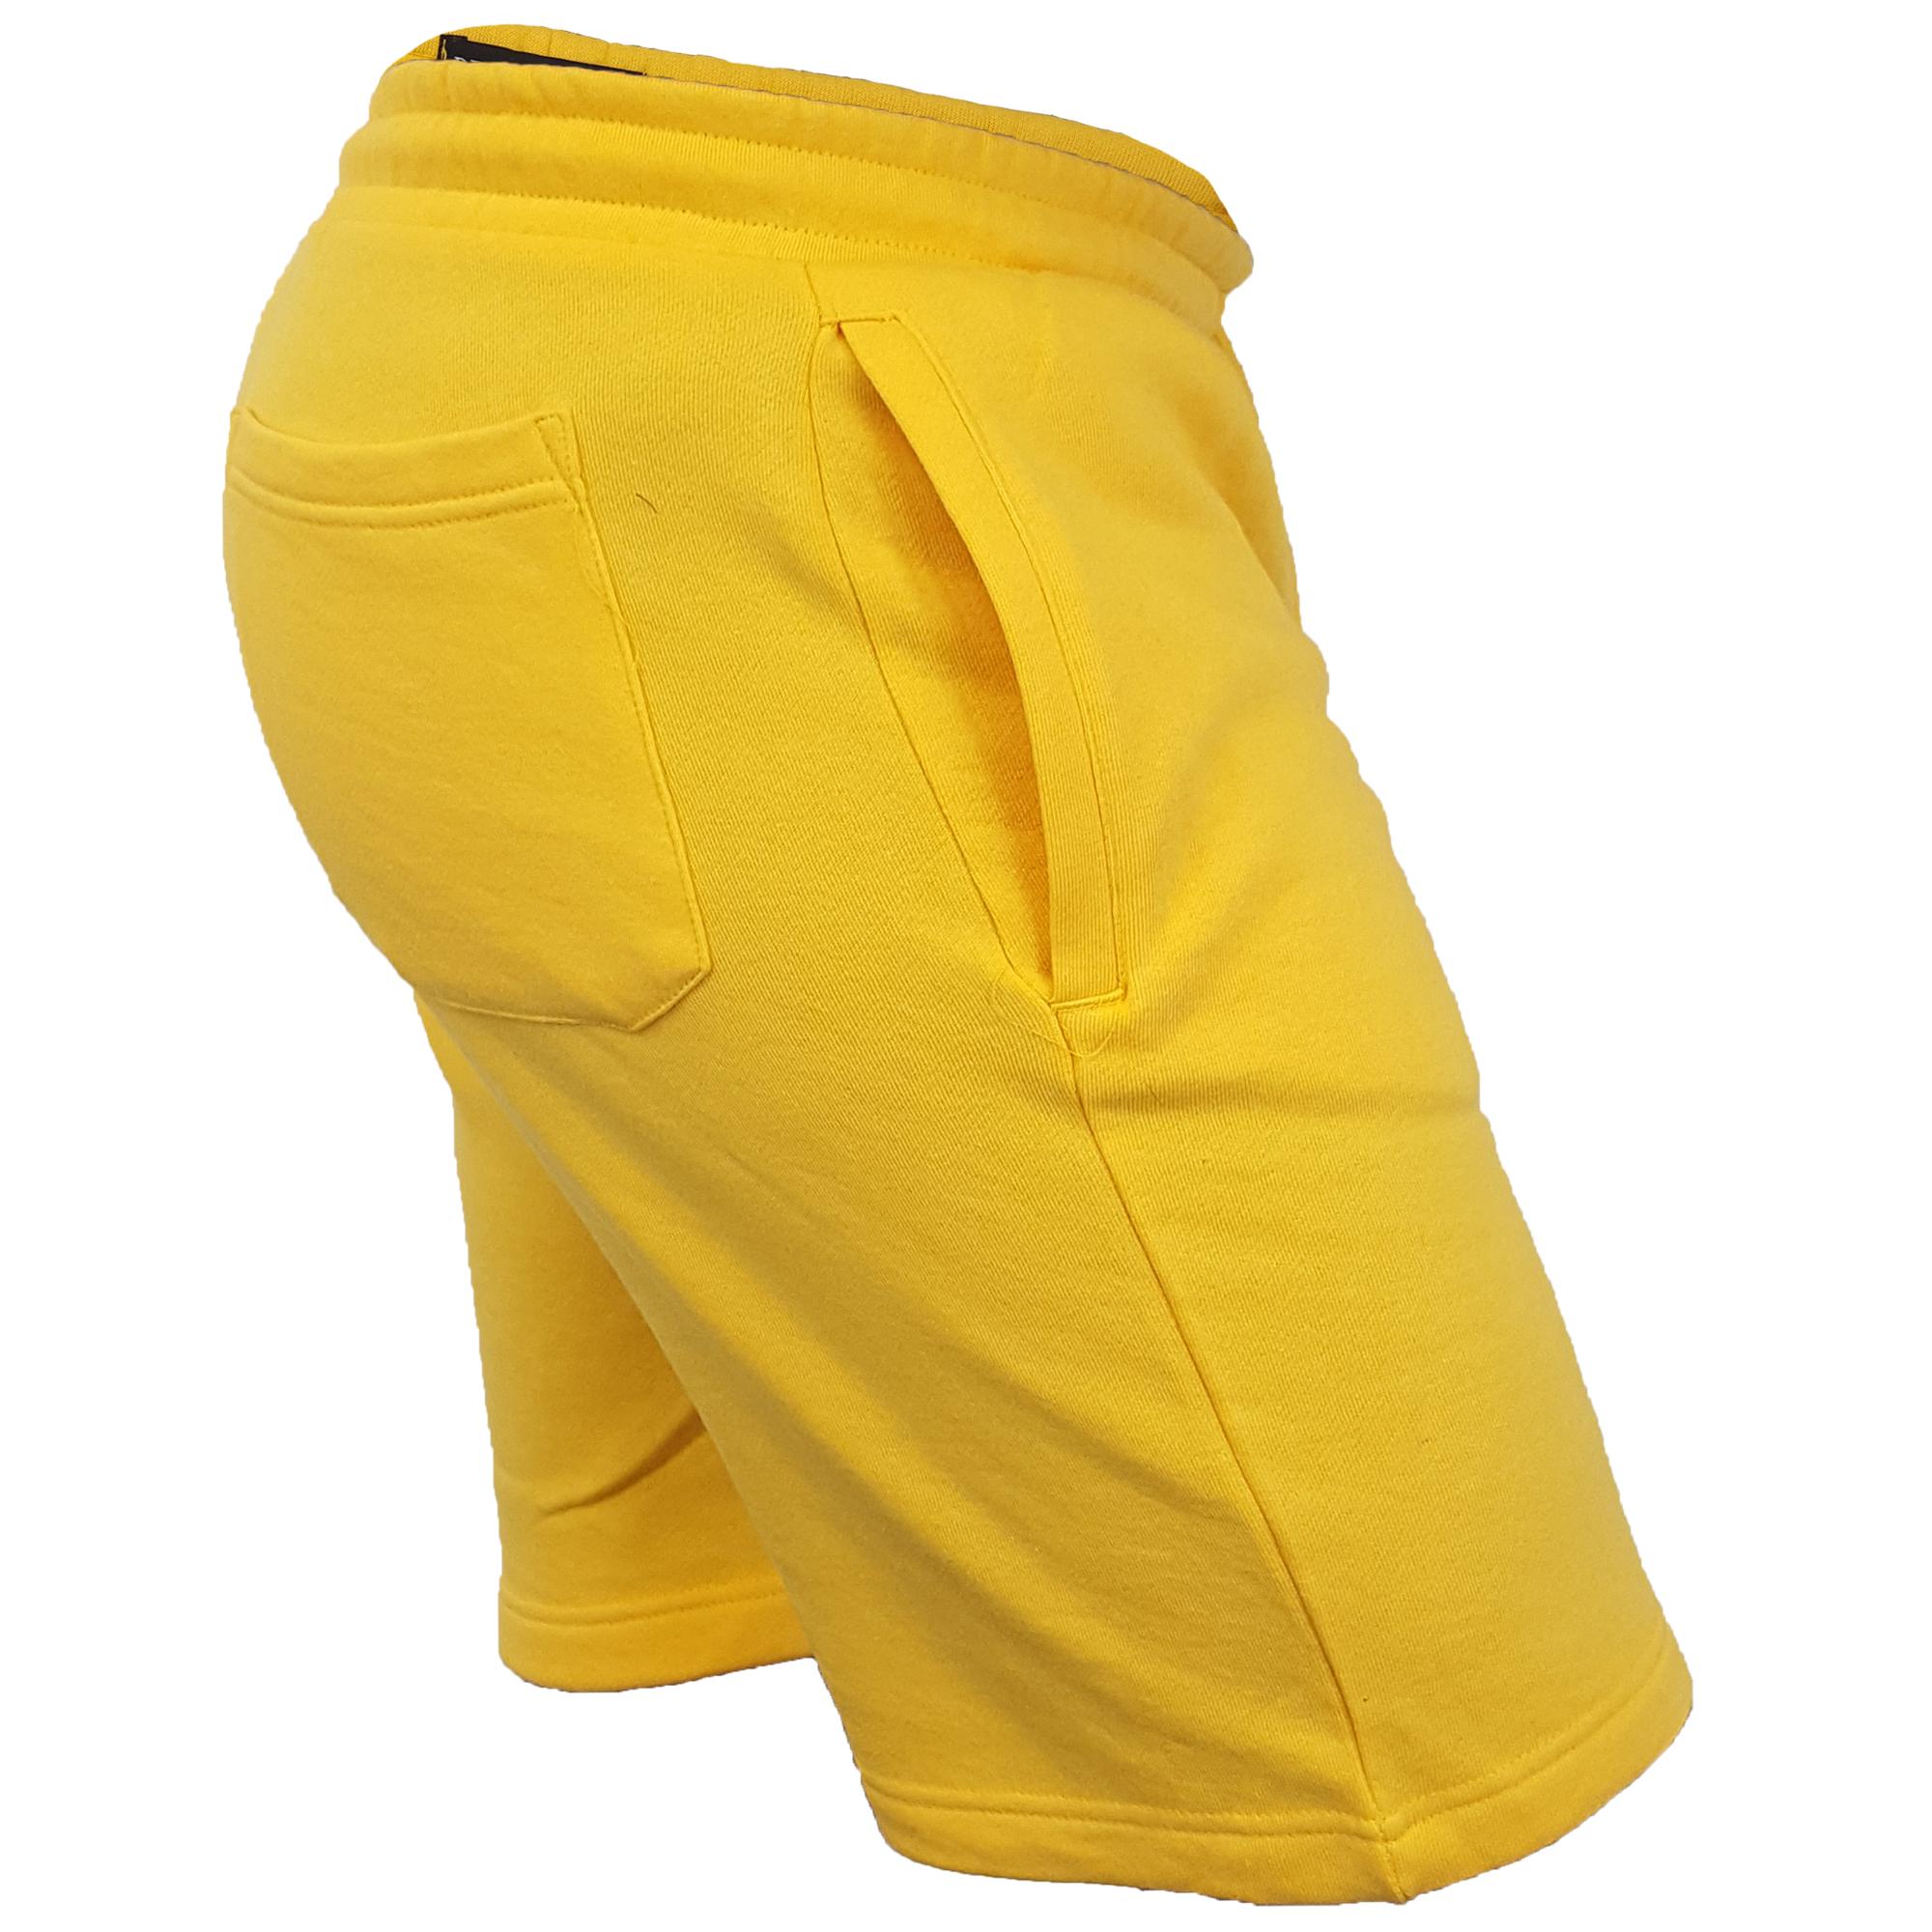 Mens-Jogger-Shorts-Tarley-by-Brave-Soul-Knee-Length-Casual-Fleece-Lined-Summer thumbnail 22